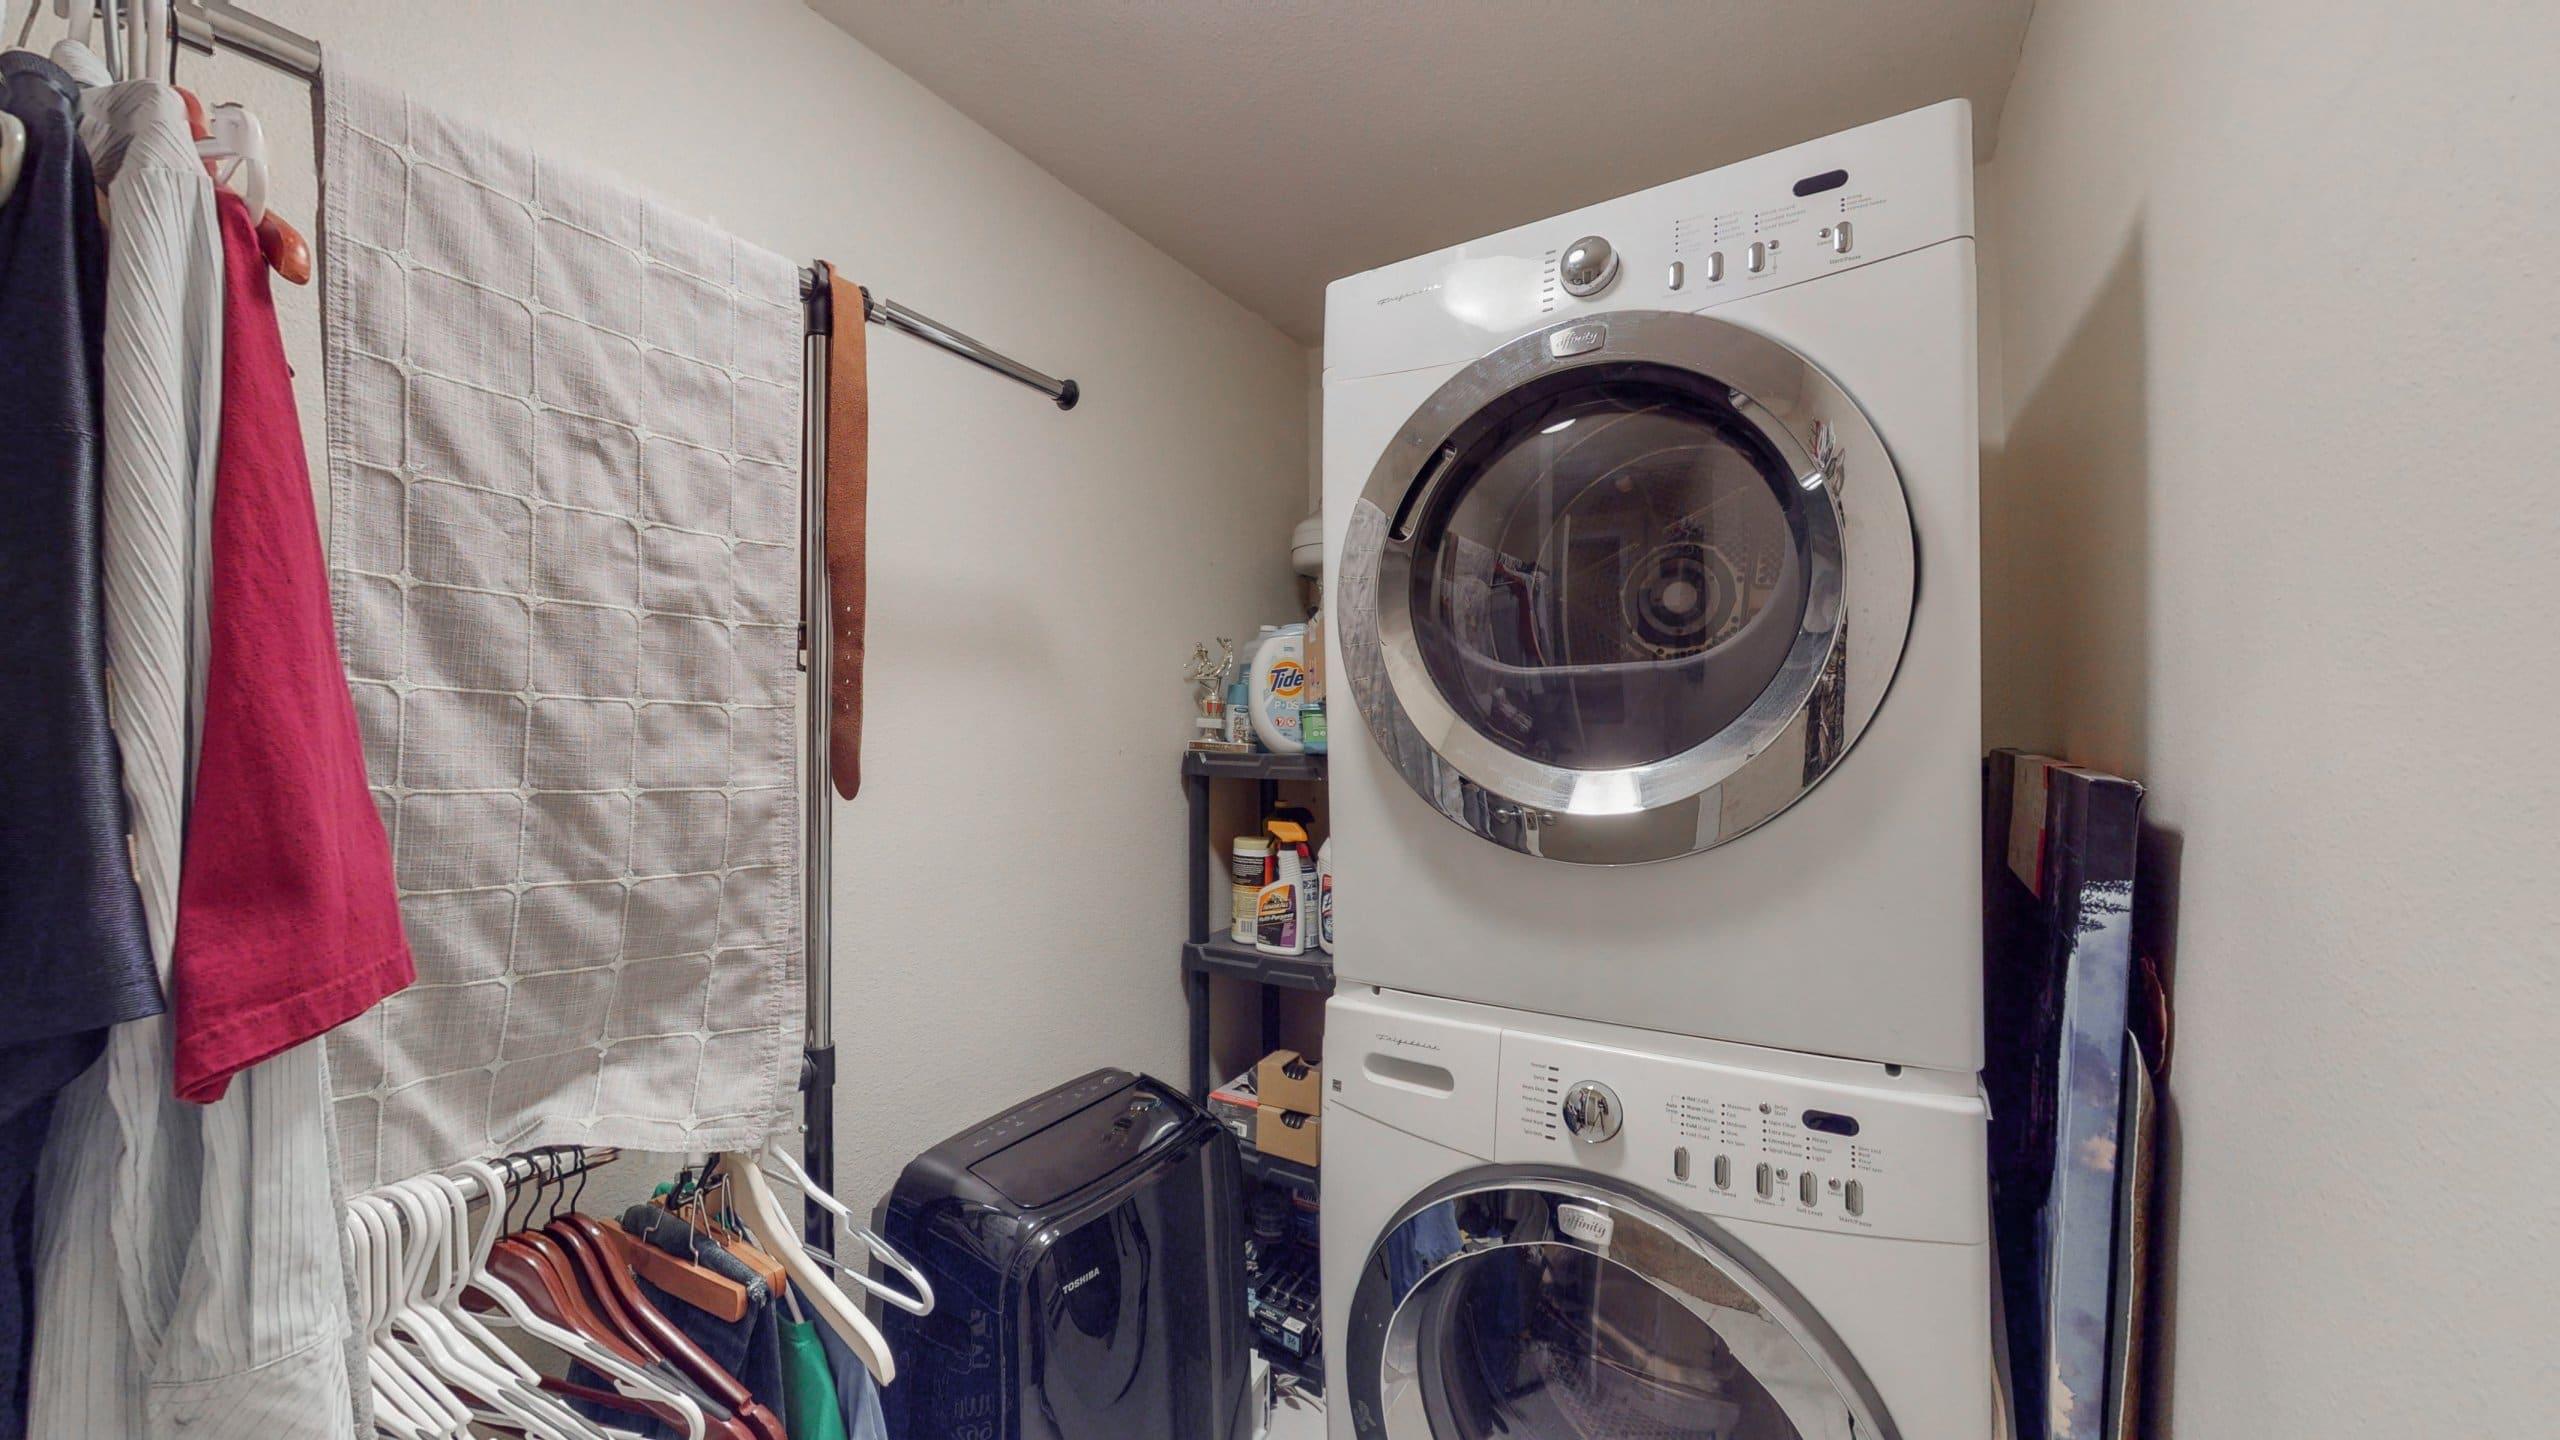 Congress Park Condo For Sale In Unit Laundry Room